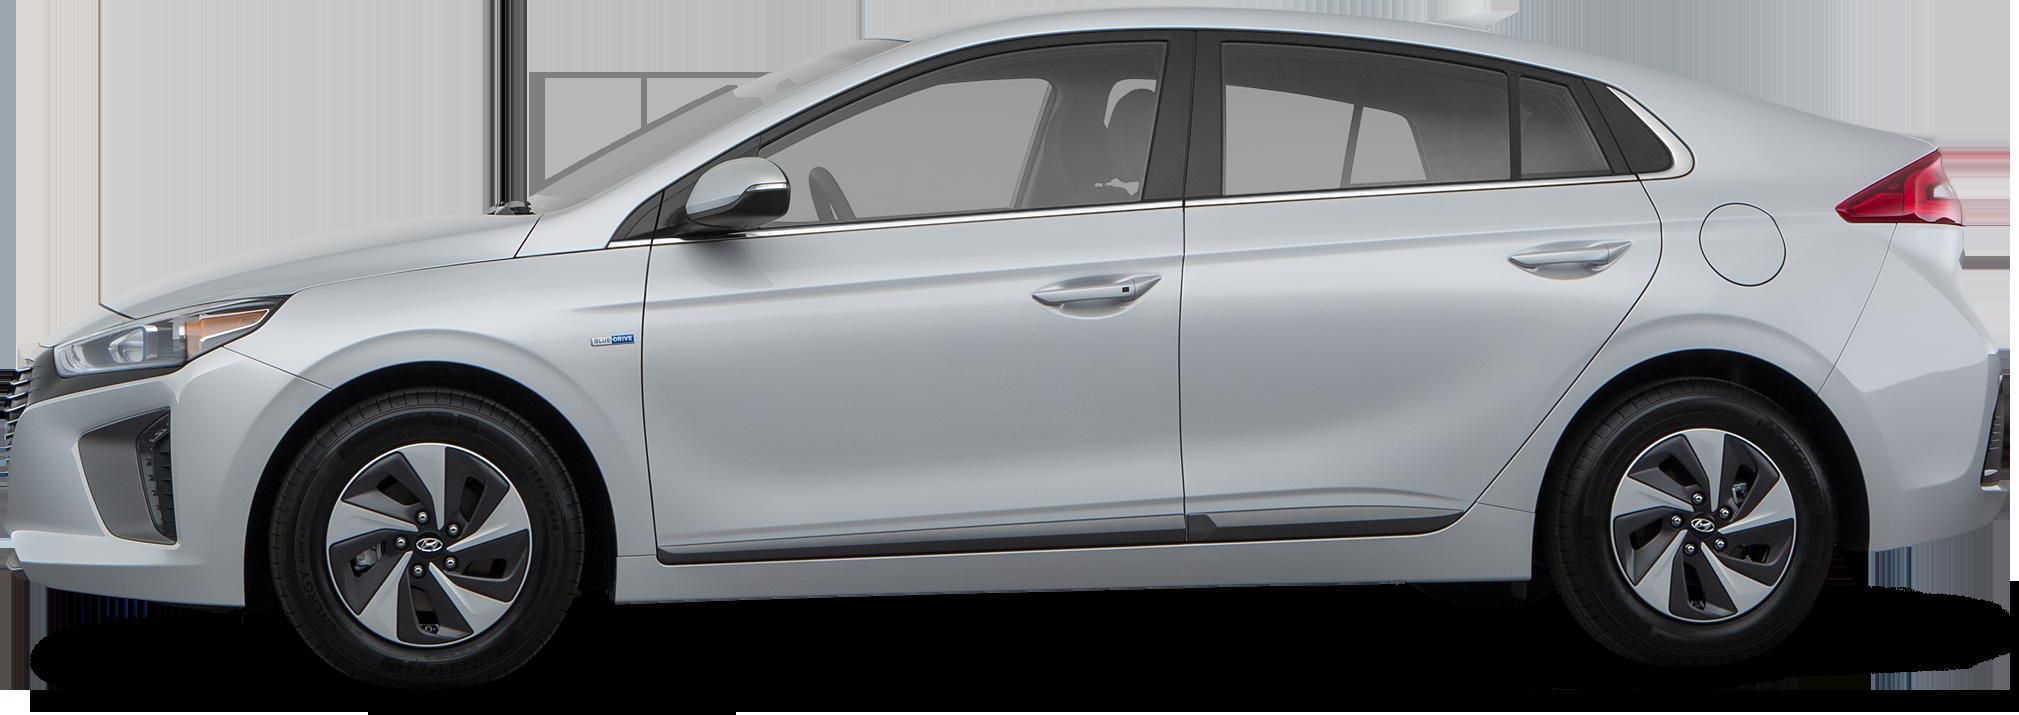 2019 Hyundai Ioniq Hybrid Hatchback SEL